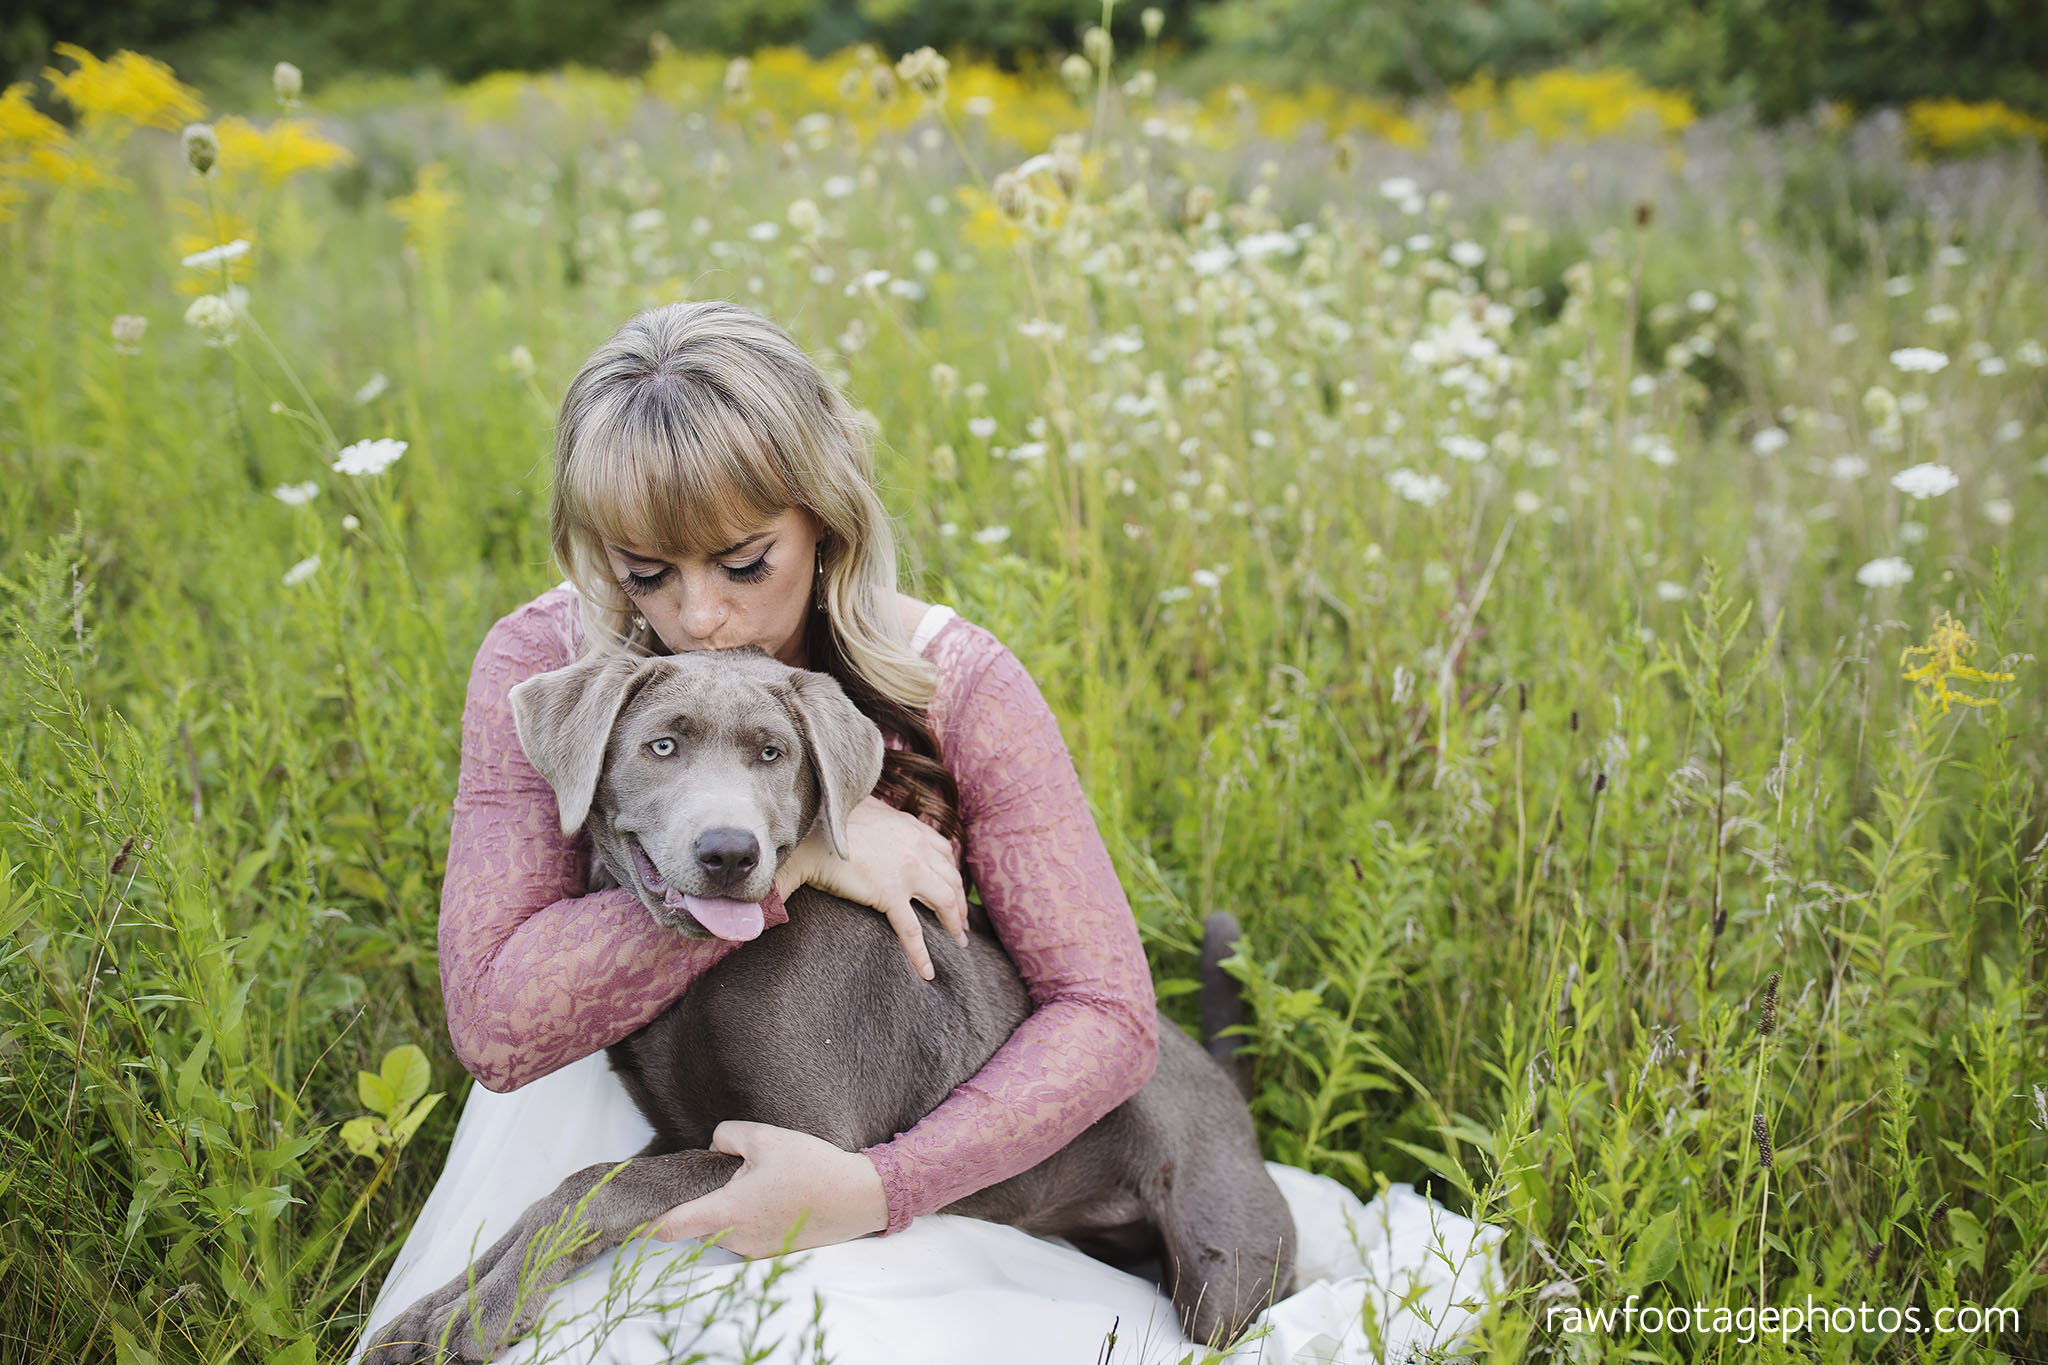 London_Ontario_Photographer-family_photography-pet_photography-lifestyle_photography003.jpg